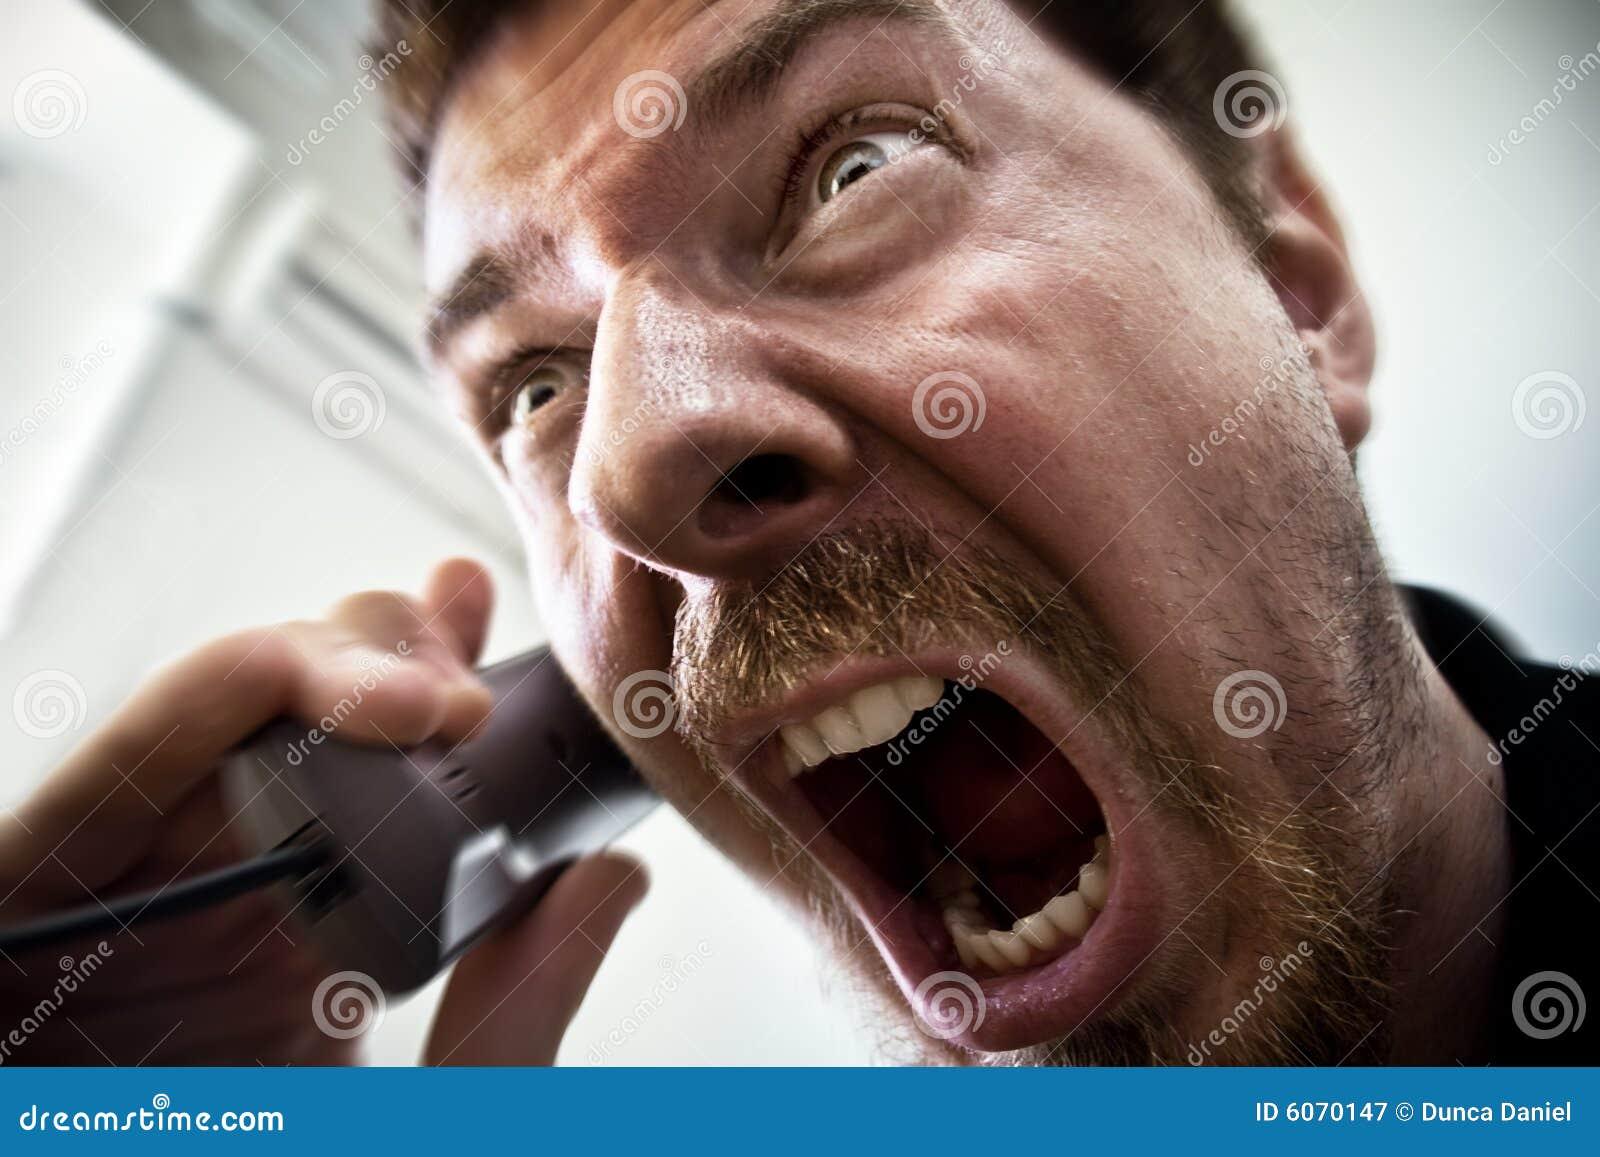 Scream of stressed man at phone